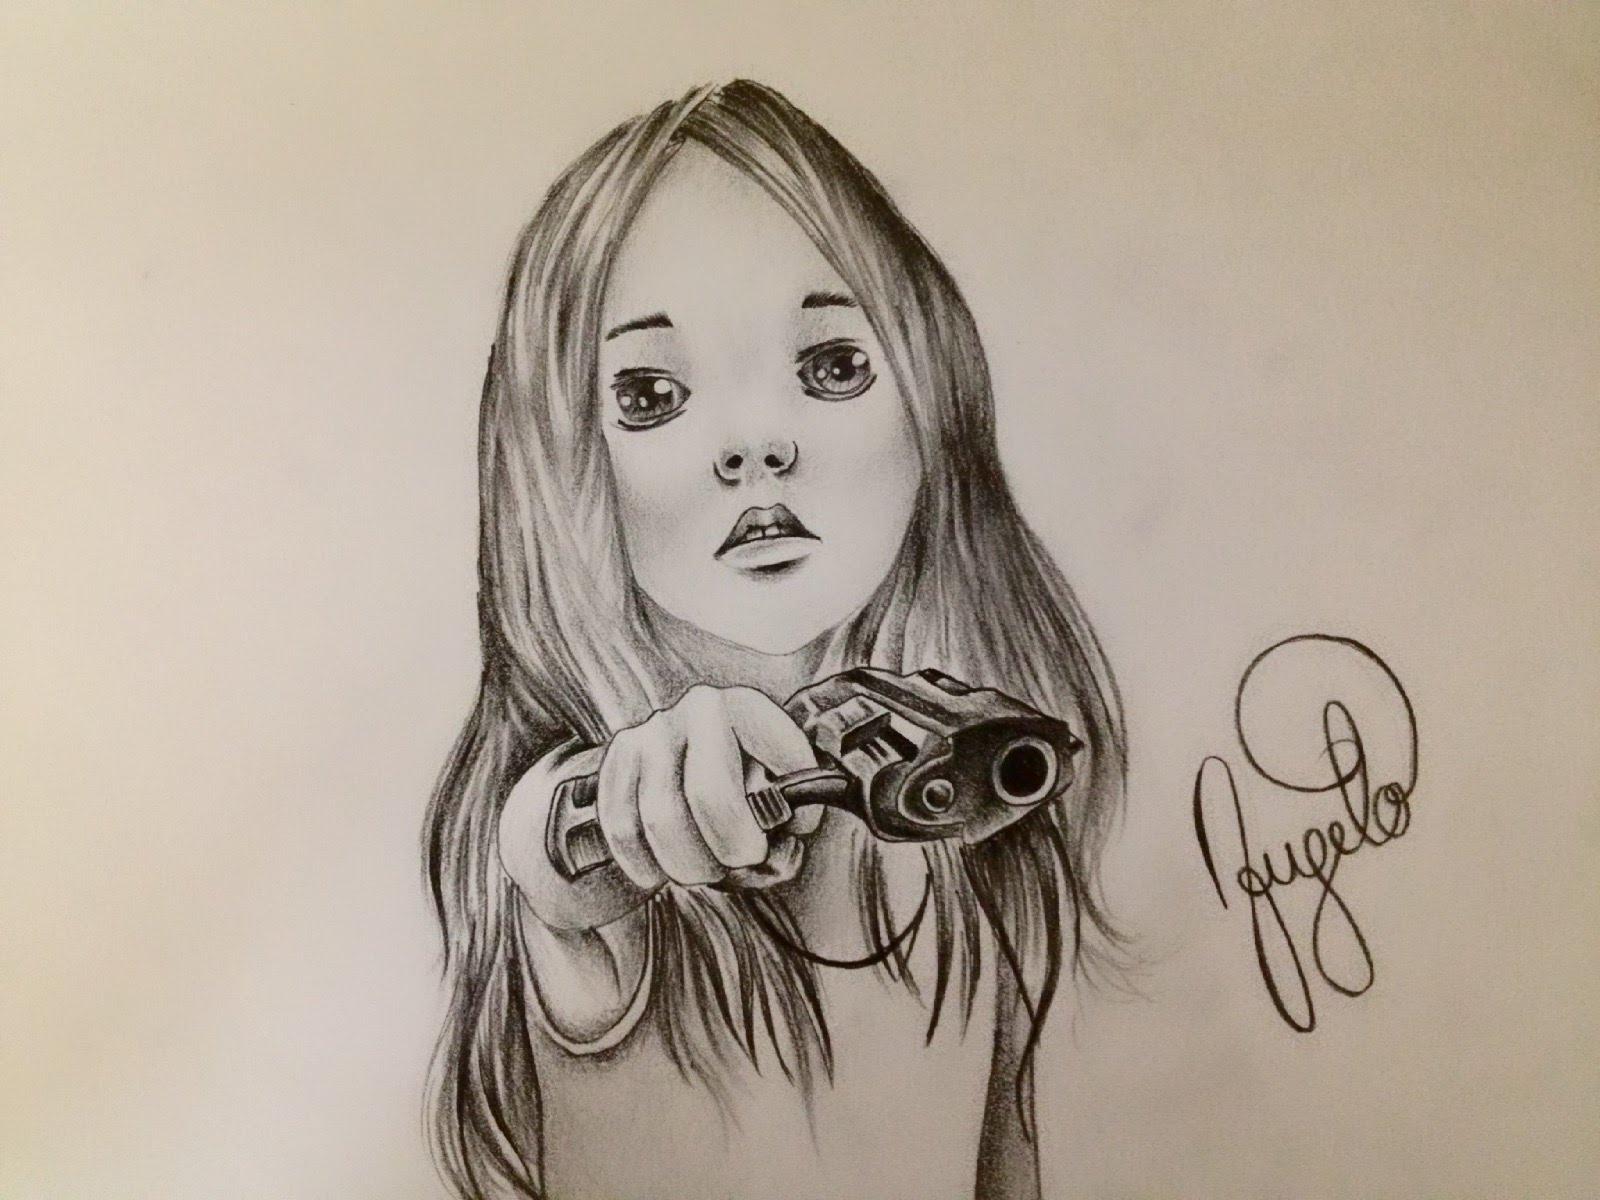 1600x1200 Sad Drawings Of People Crying How To Draw Cute Sad Anime Girl